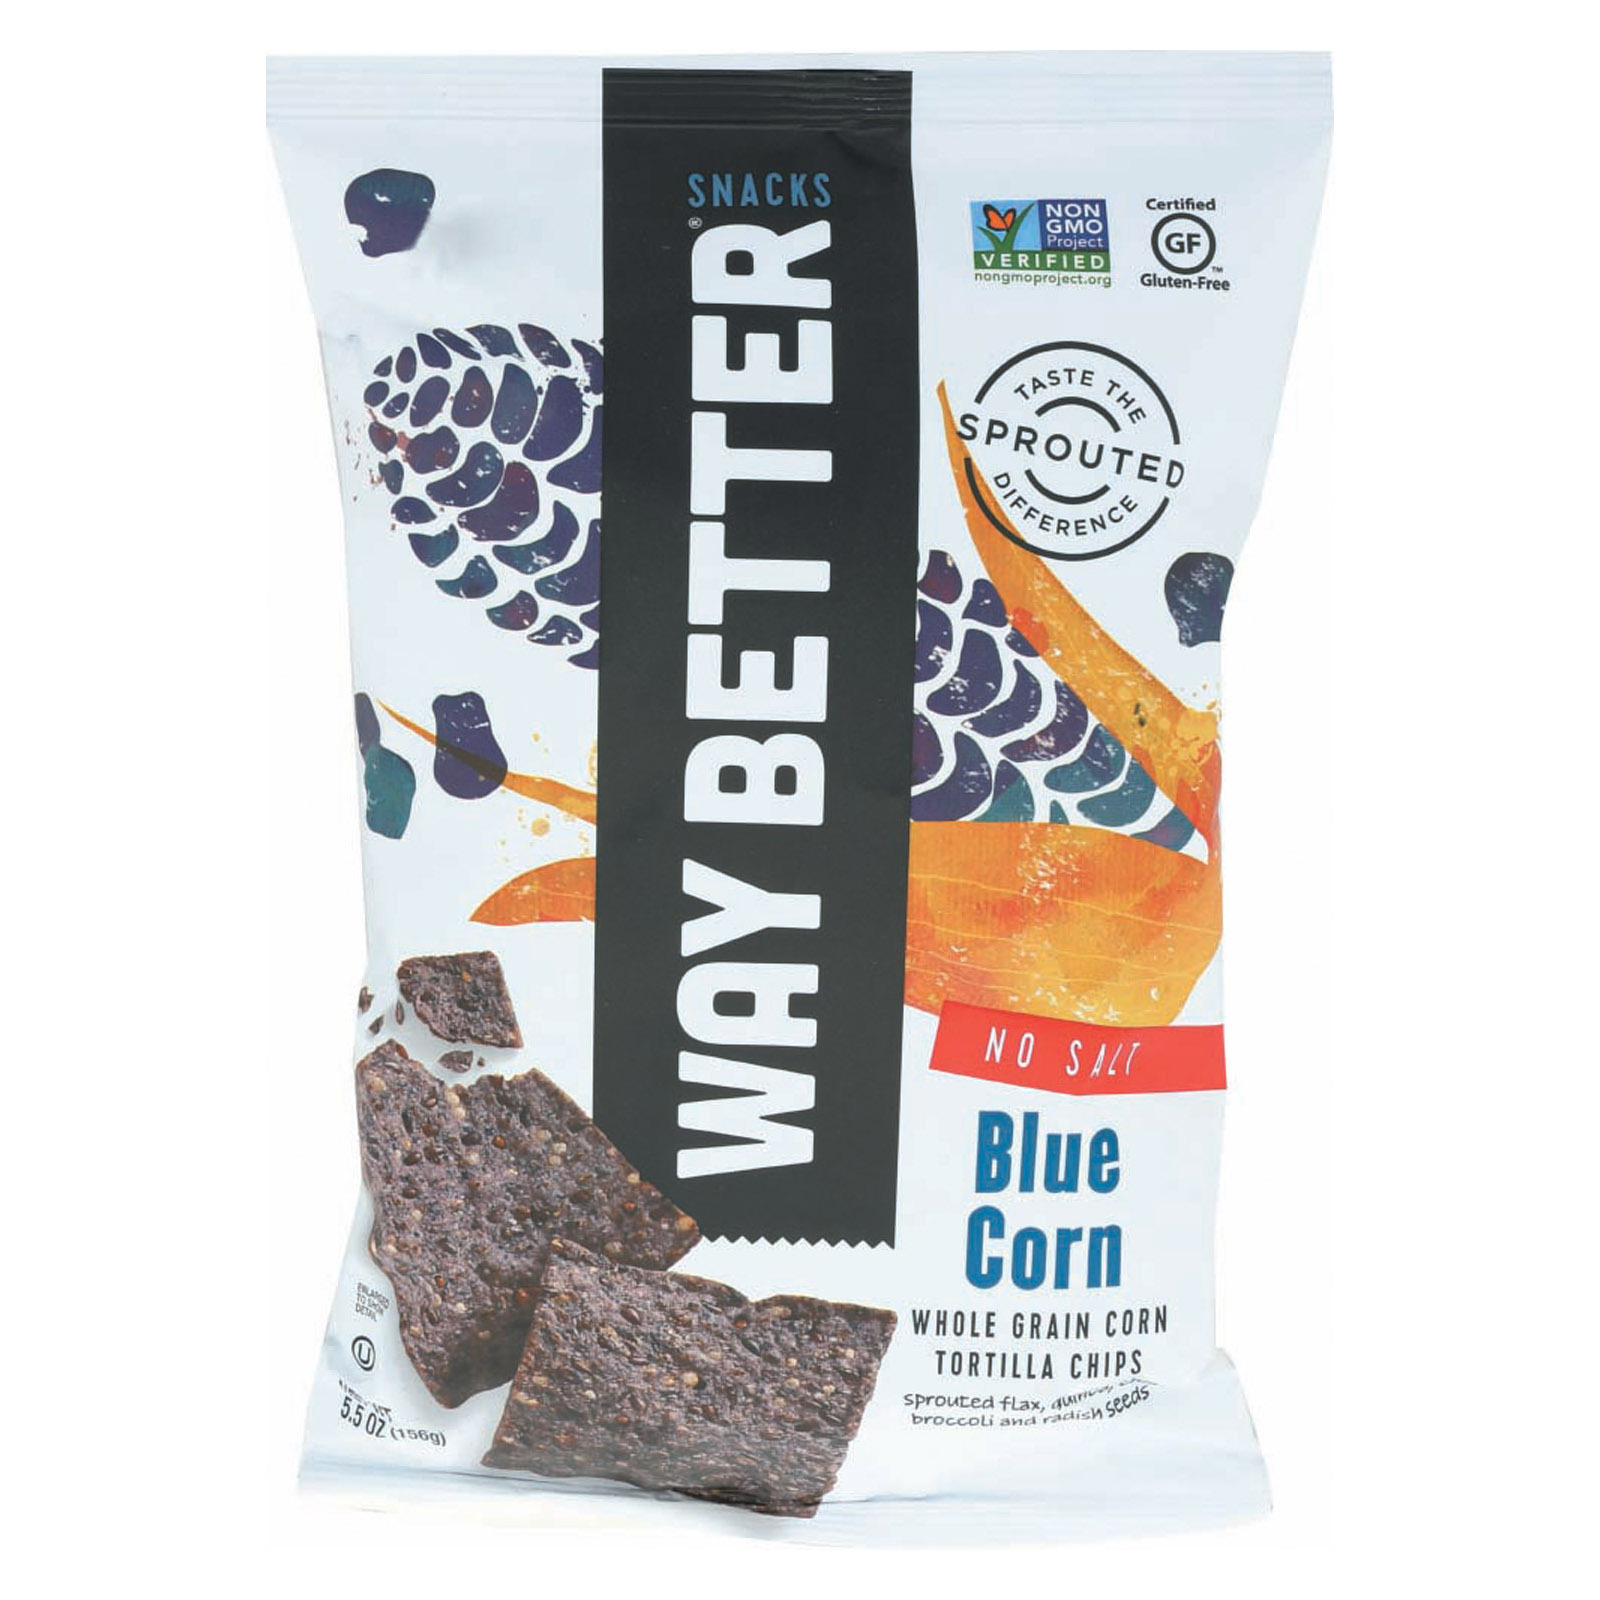 Way Better Snacks Tortilla Chips - No Salt Blue Corn - Case of 12 - 5.5 oz.